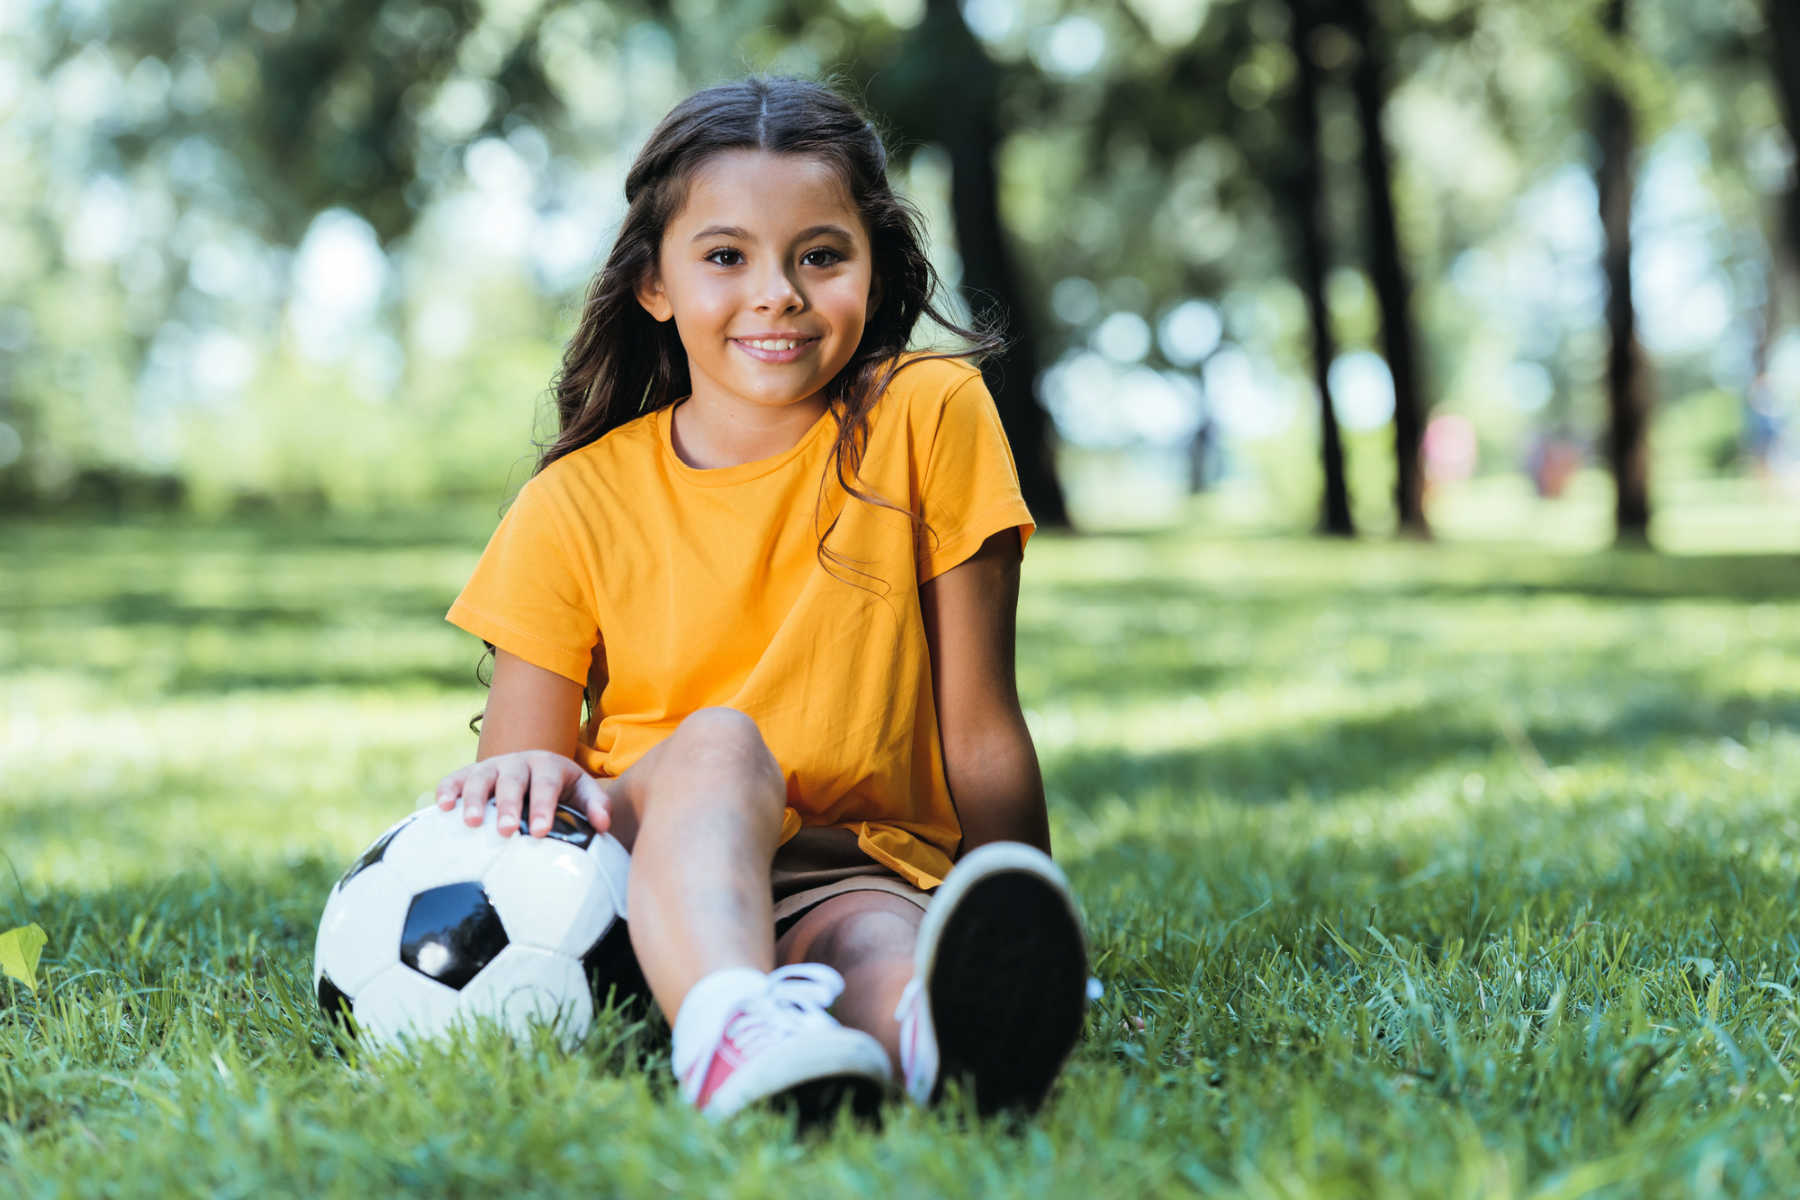 kids-sport-lake-macquarie-kids-need-exercise-main